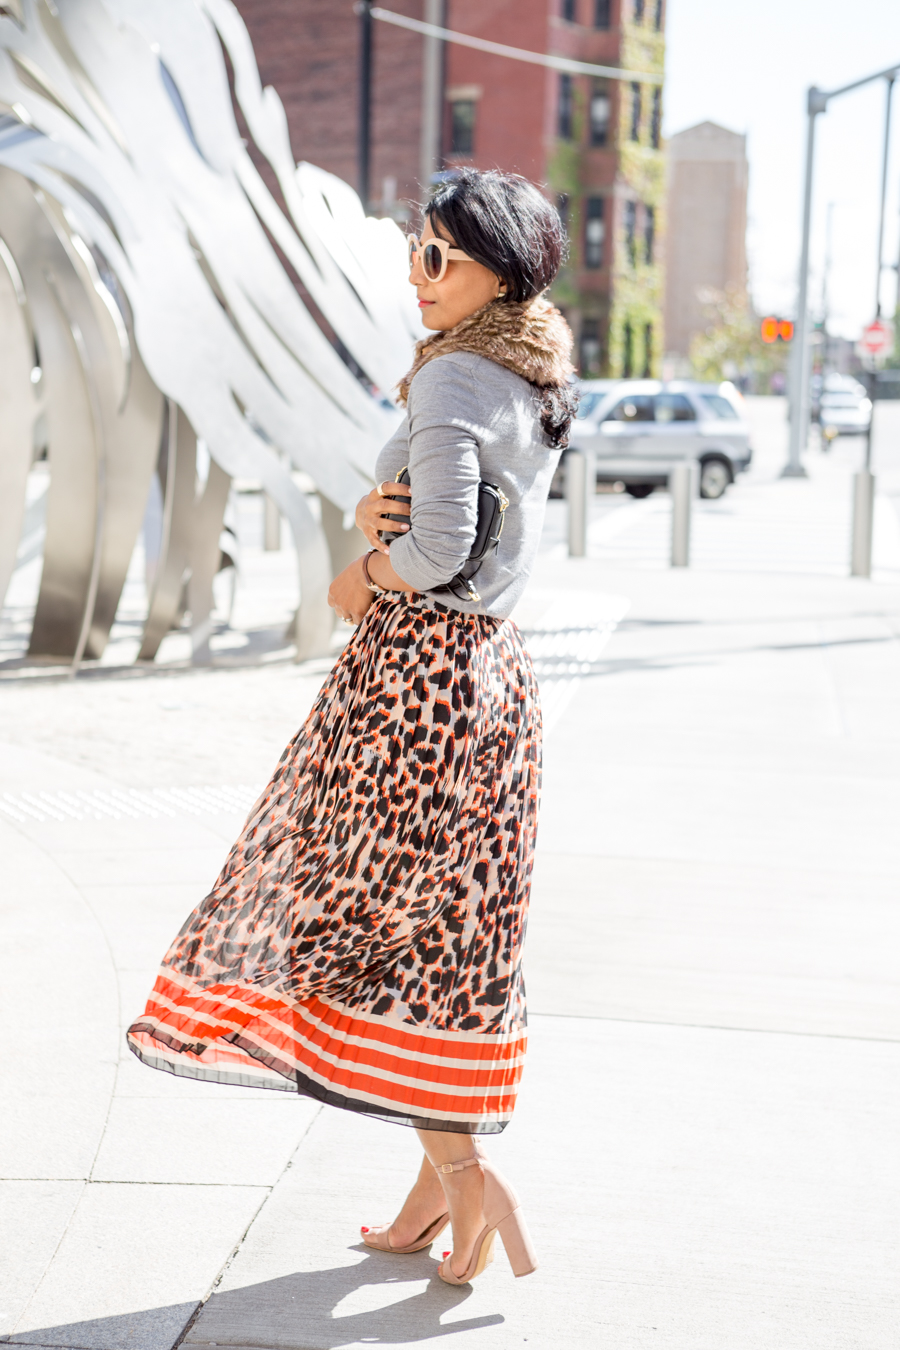 fall fashion, wardrobe essential, fall classics, banana republic, petite fashion, pleated midi skirt, faux fur, block heel, fall lookbook, petite style, office style, work style, corporate chic, colorful, neutrals, new york fashion week, fall fashion trends